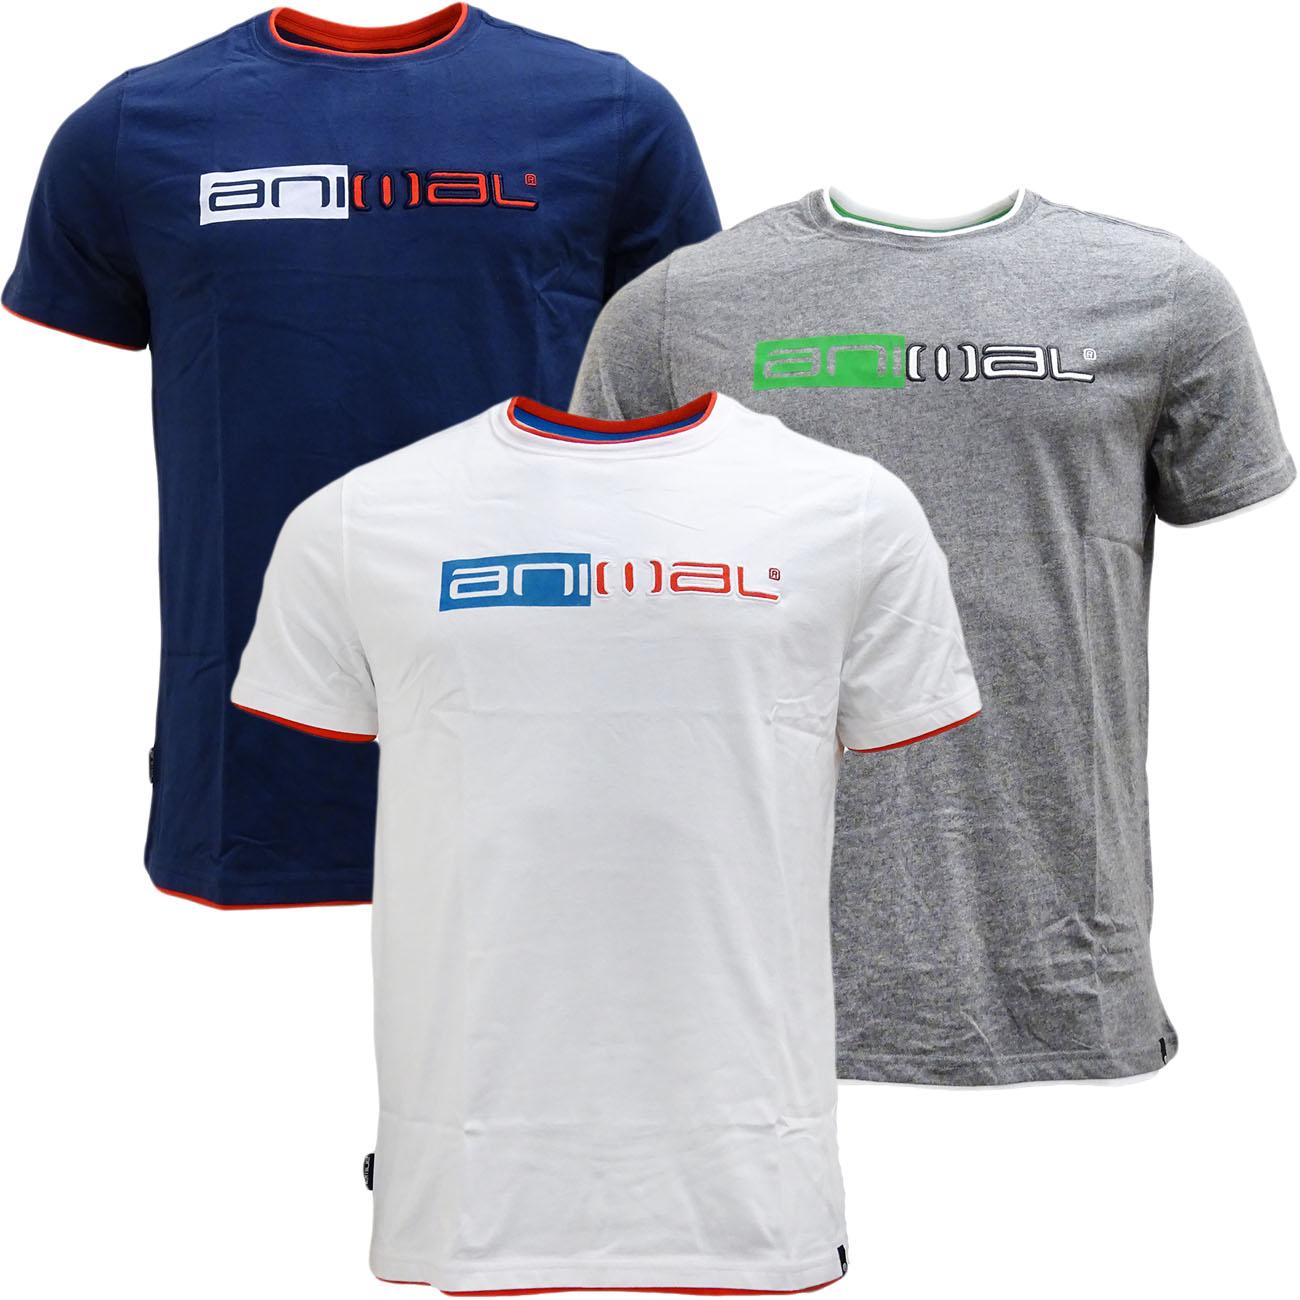 Mens Animal T Shirt - Regular Fit